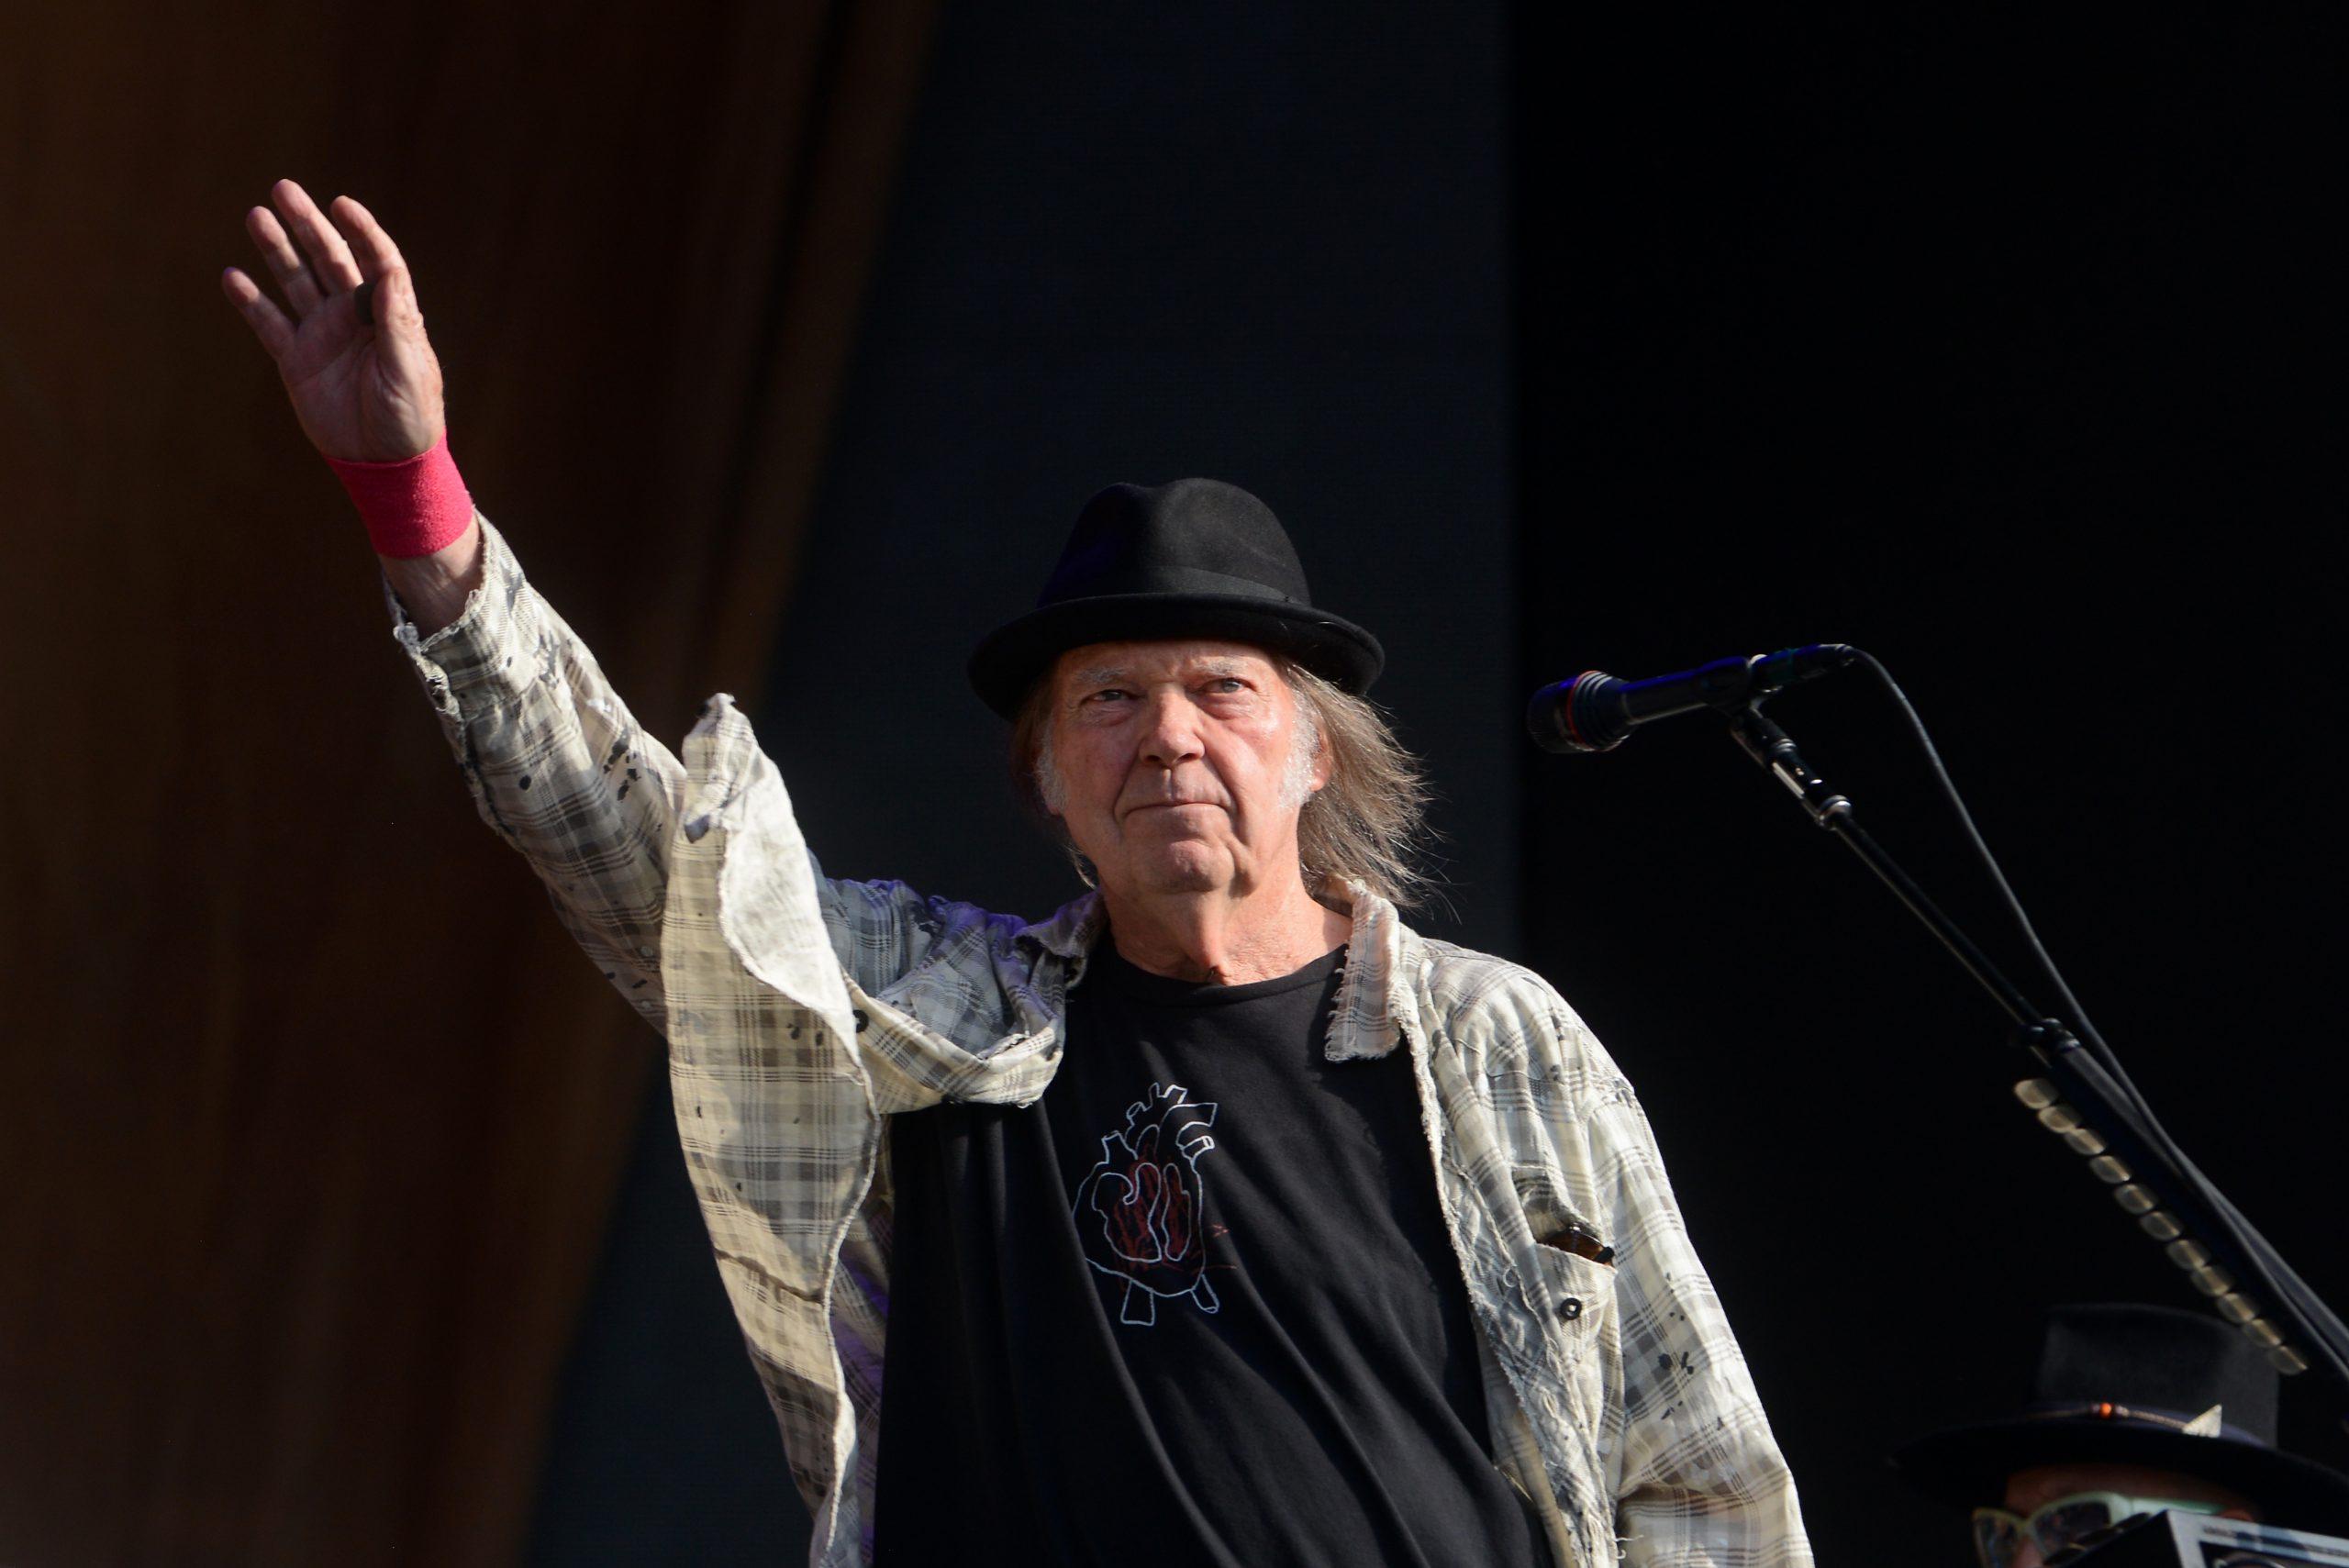 Neil-A ver si así: Neil Young demanda a Donald Trump por seguir usando sus canciones-1